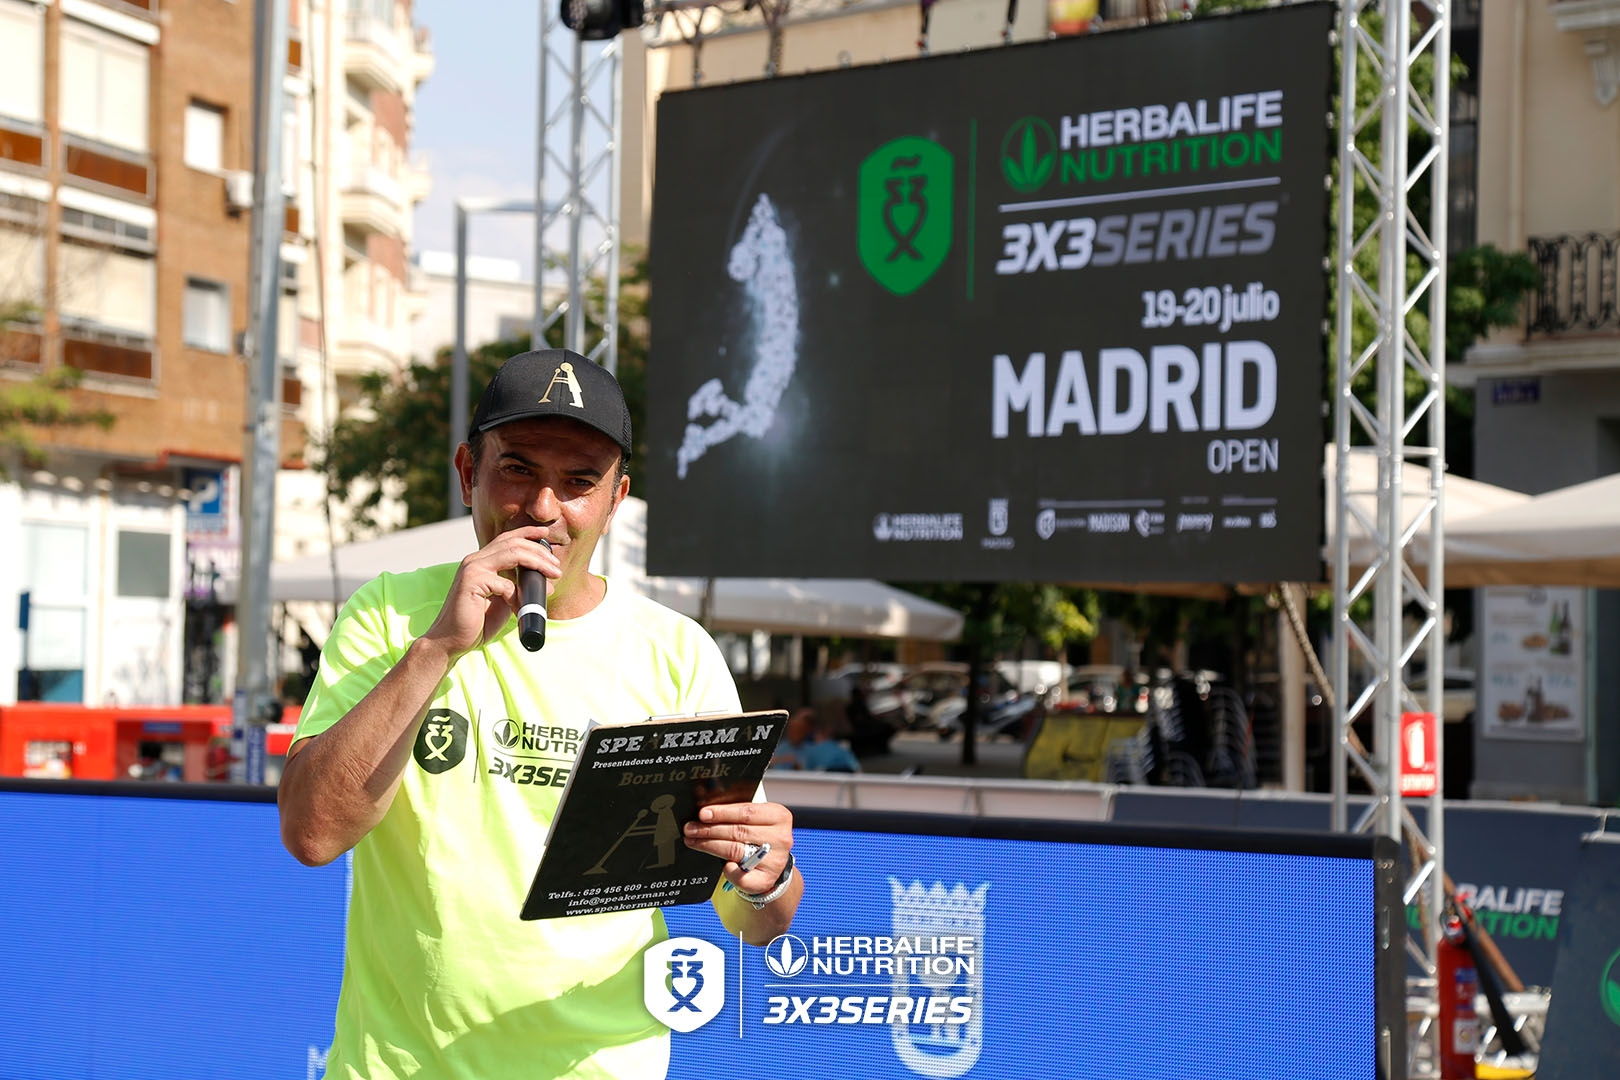 MadridOpen2019_Herbalife3x3Series_viernes_04